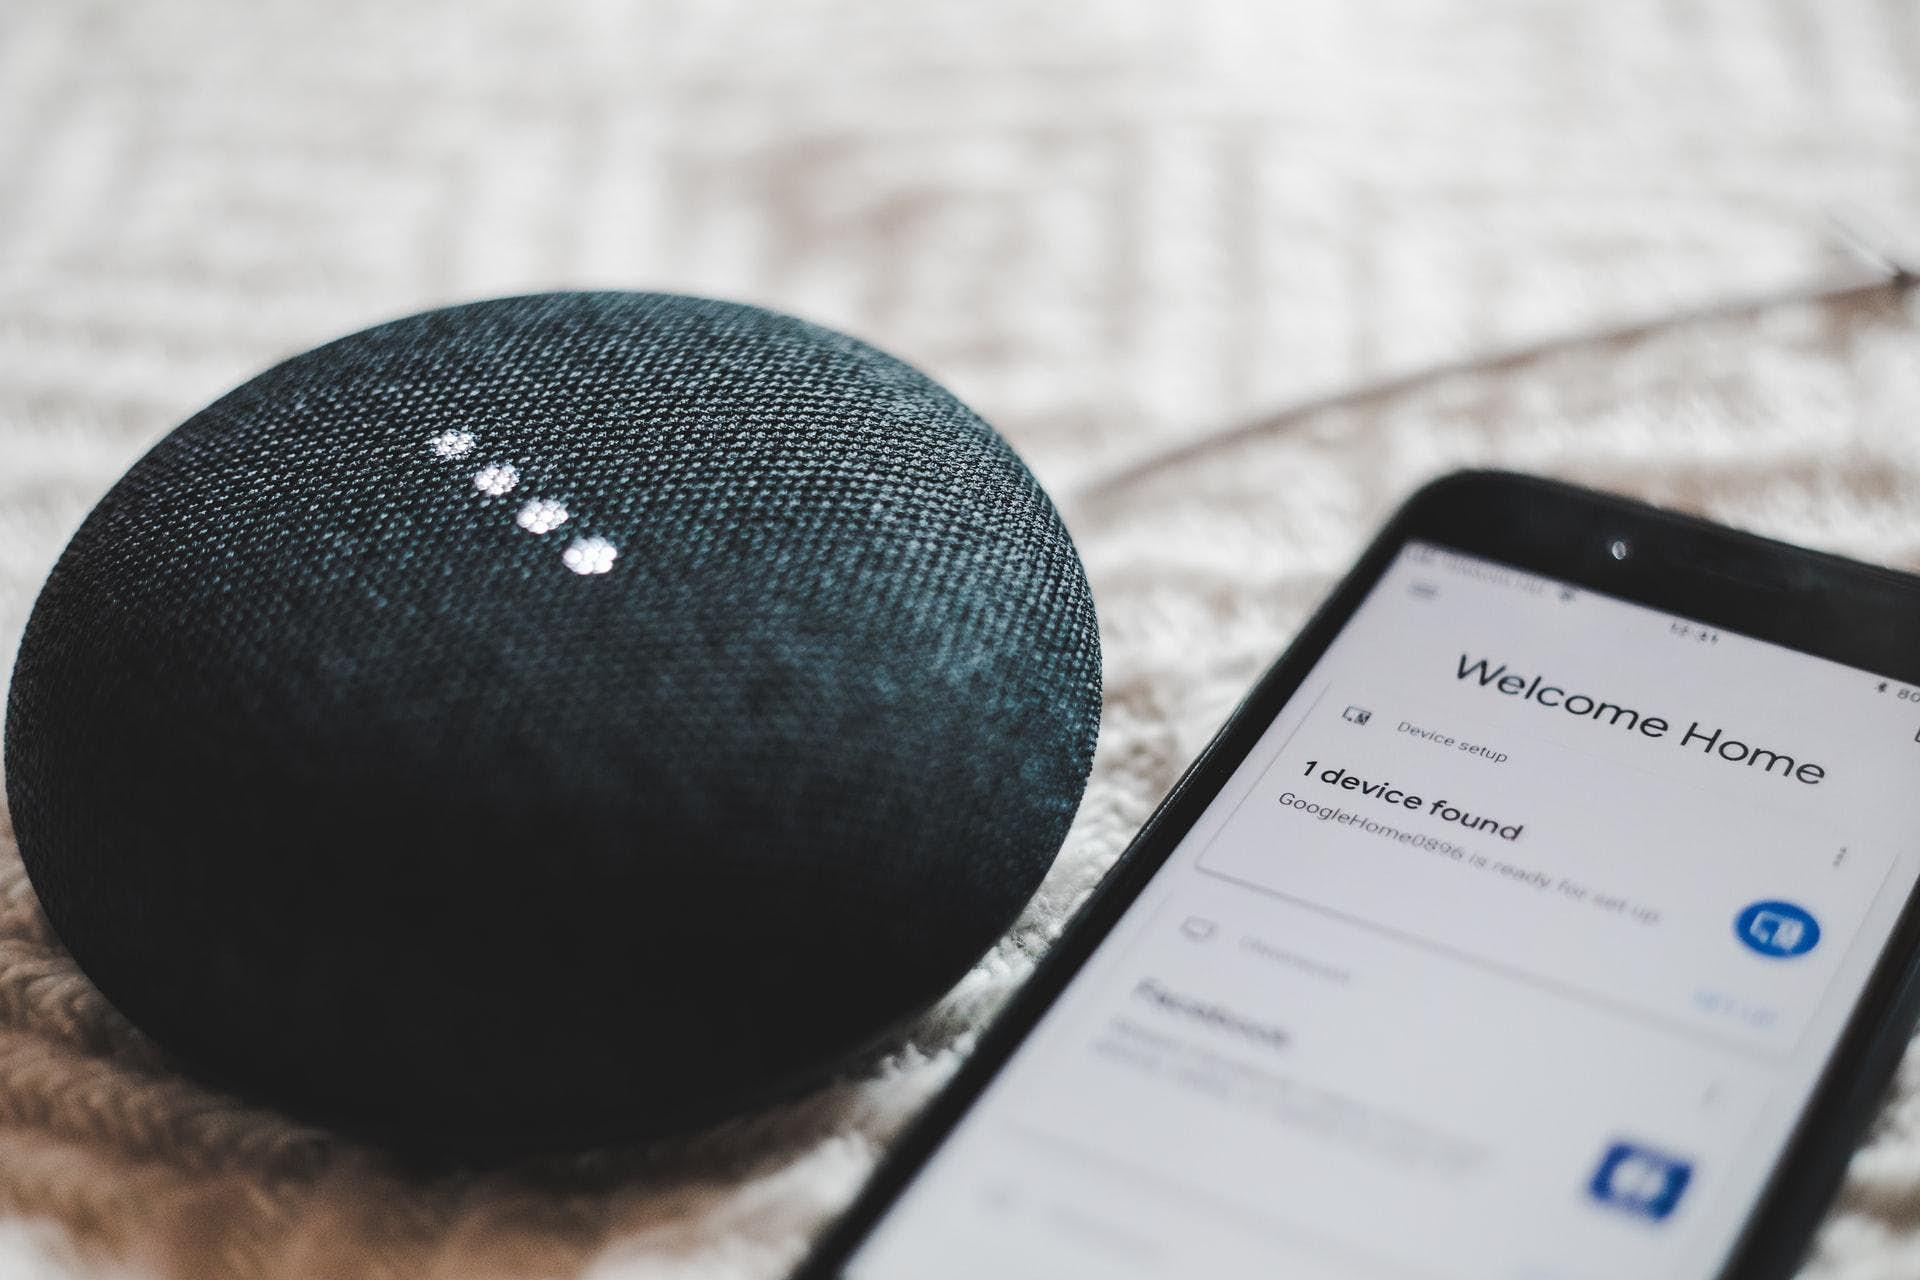 Are smart speakers worth it?